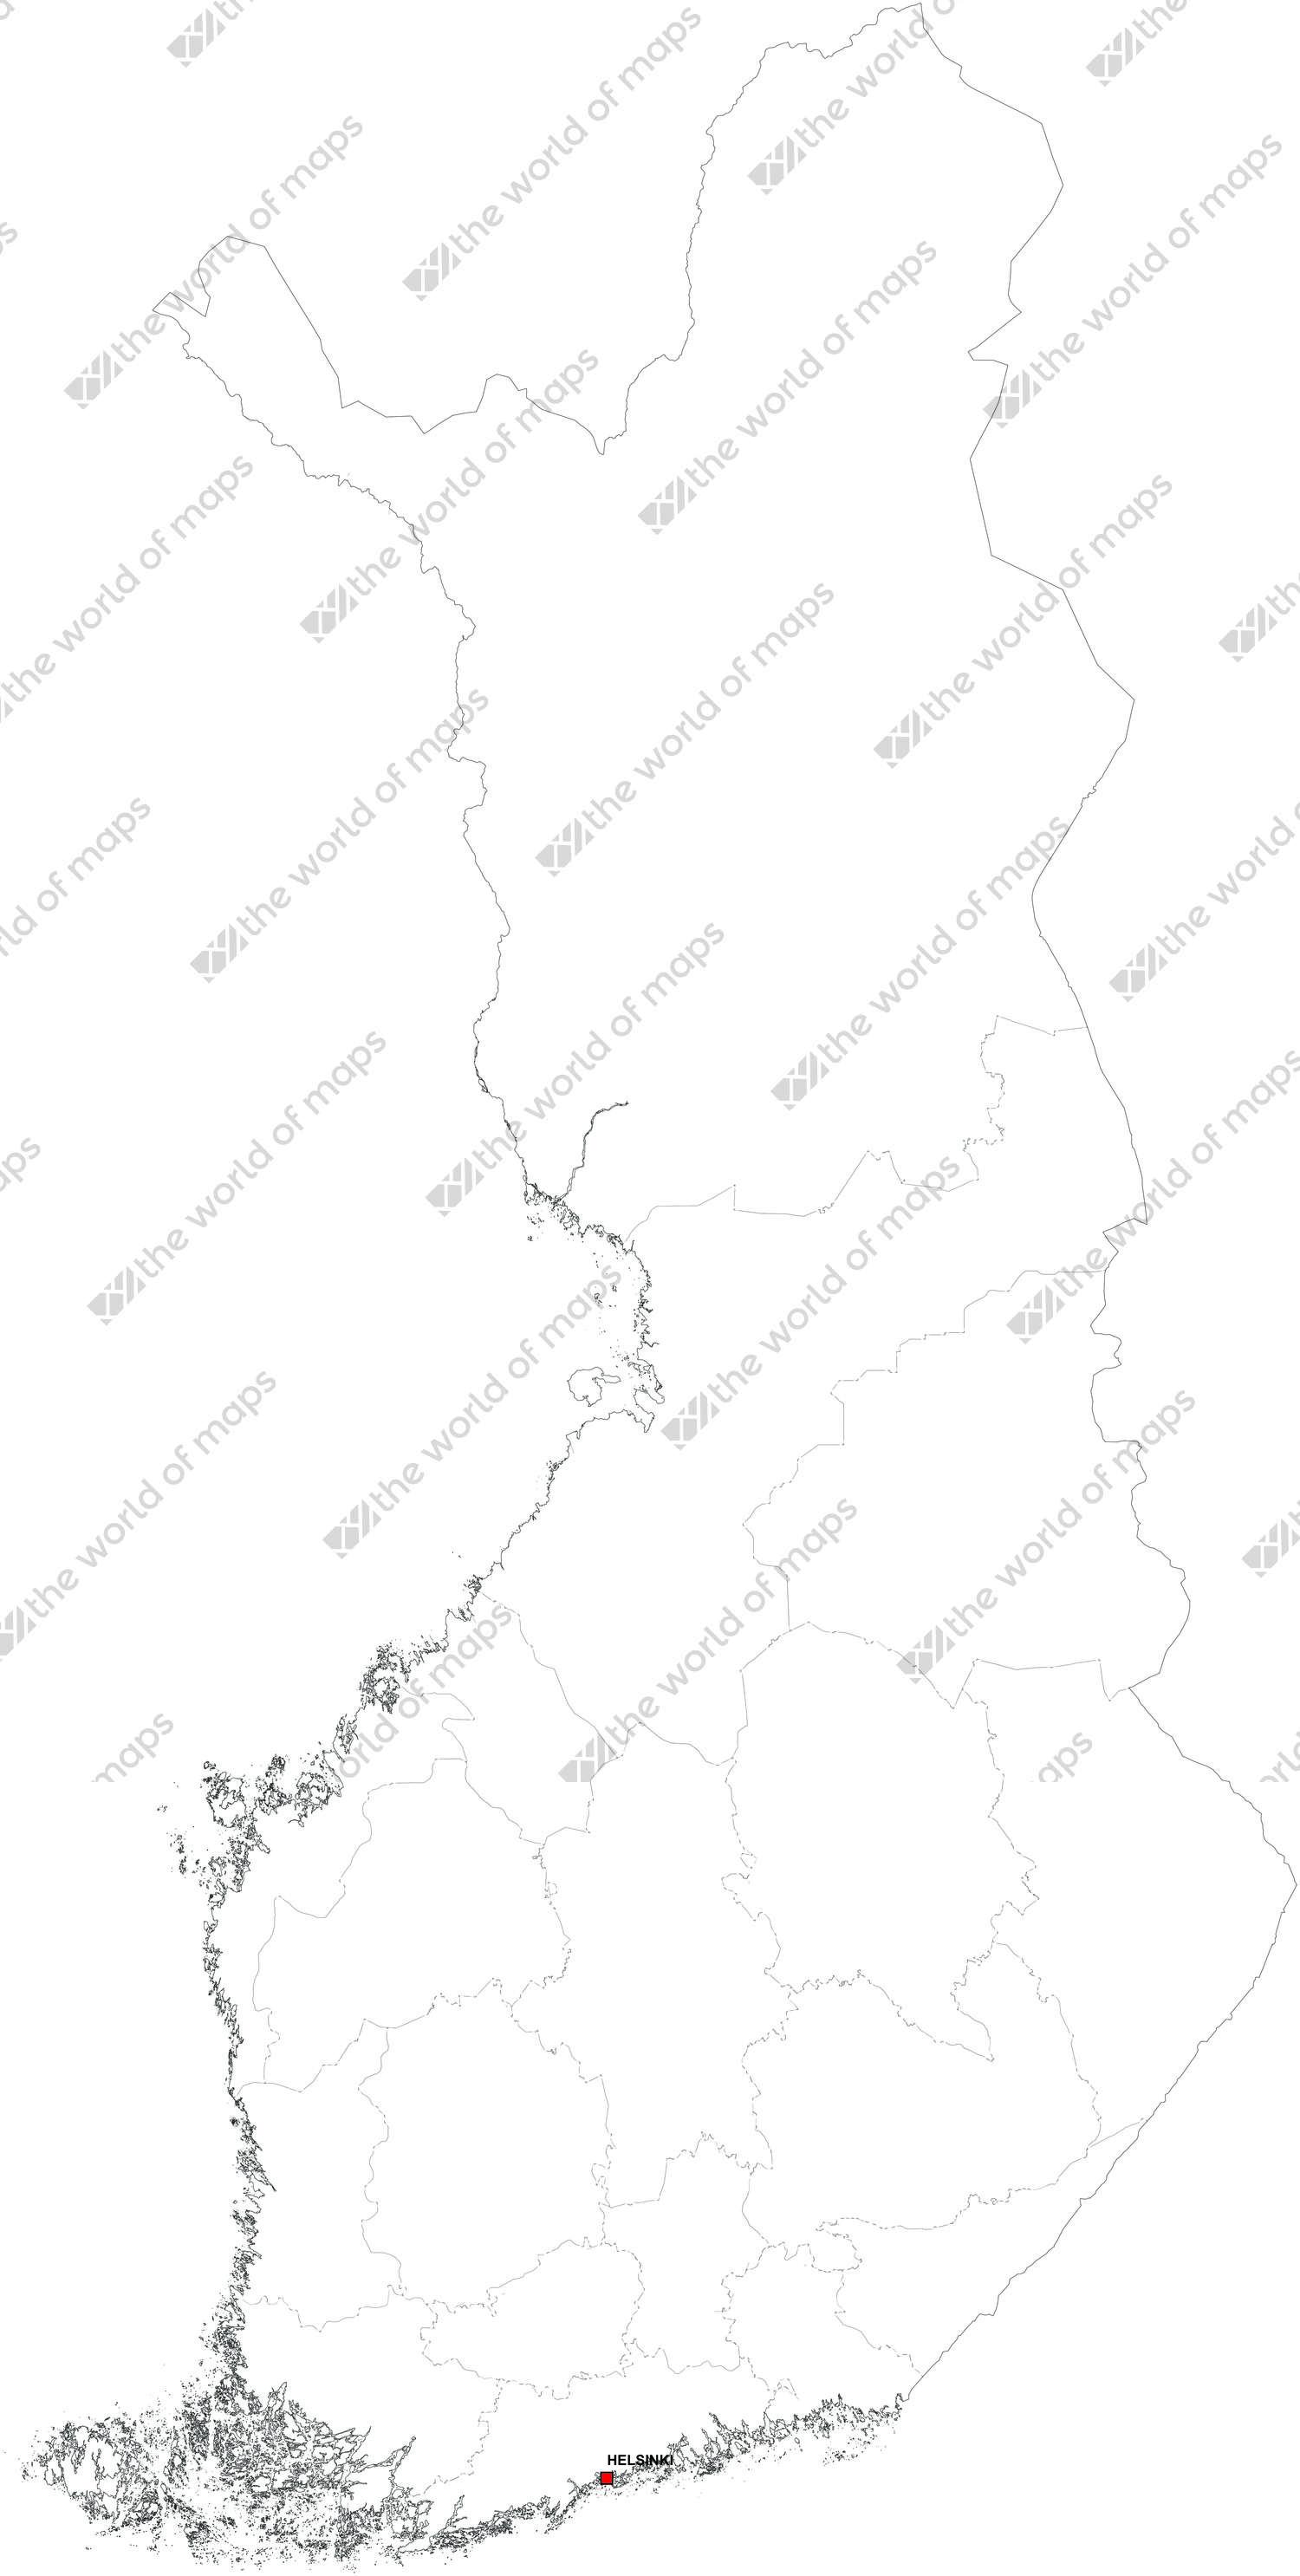 Digital map of Finland (free)